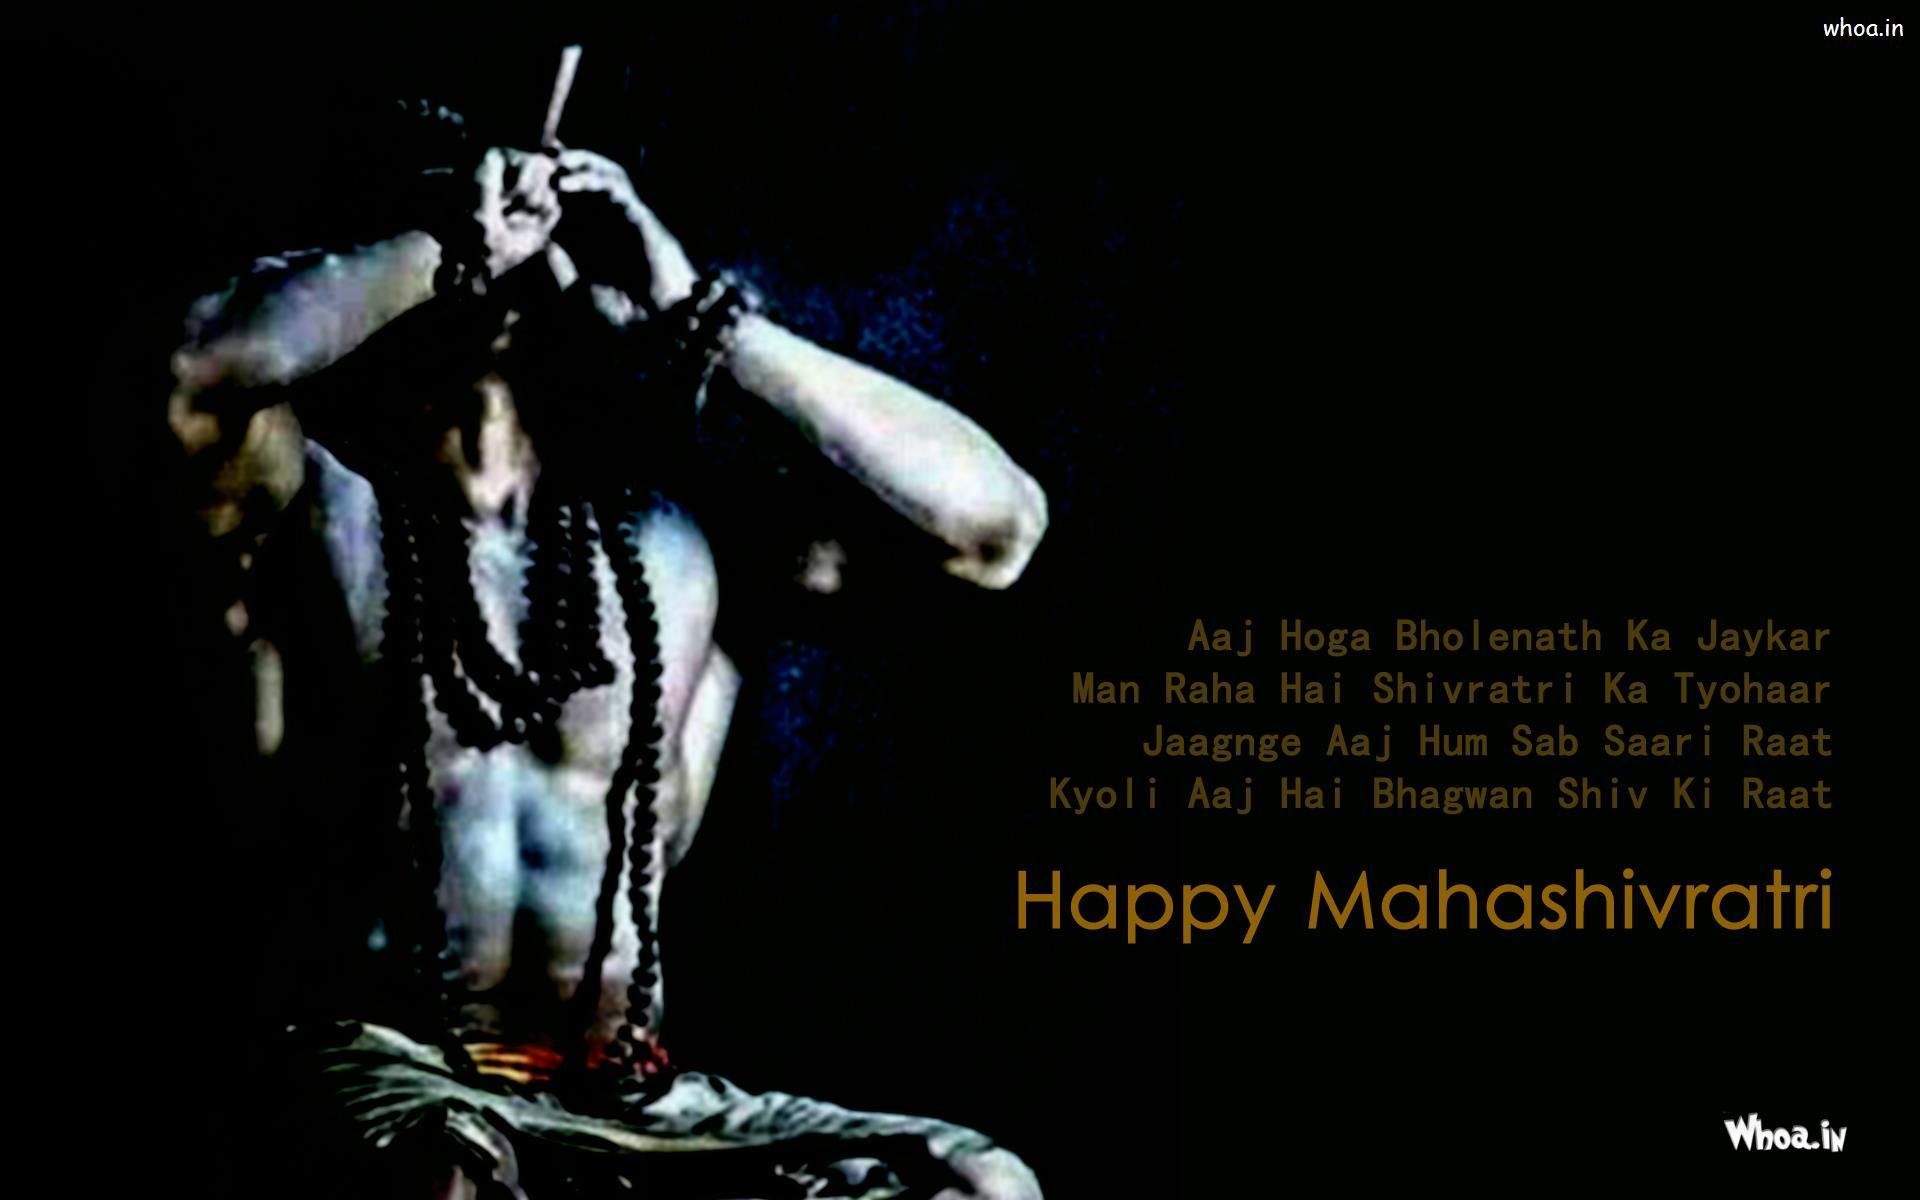 Hd wallpaper bholenath - Happy Mahashivratri Wallpapers Jay Bholenath